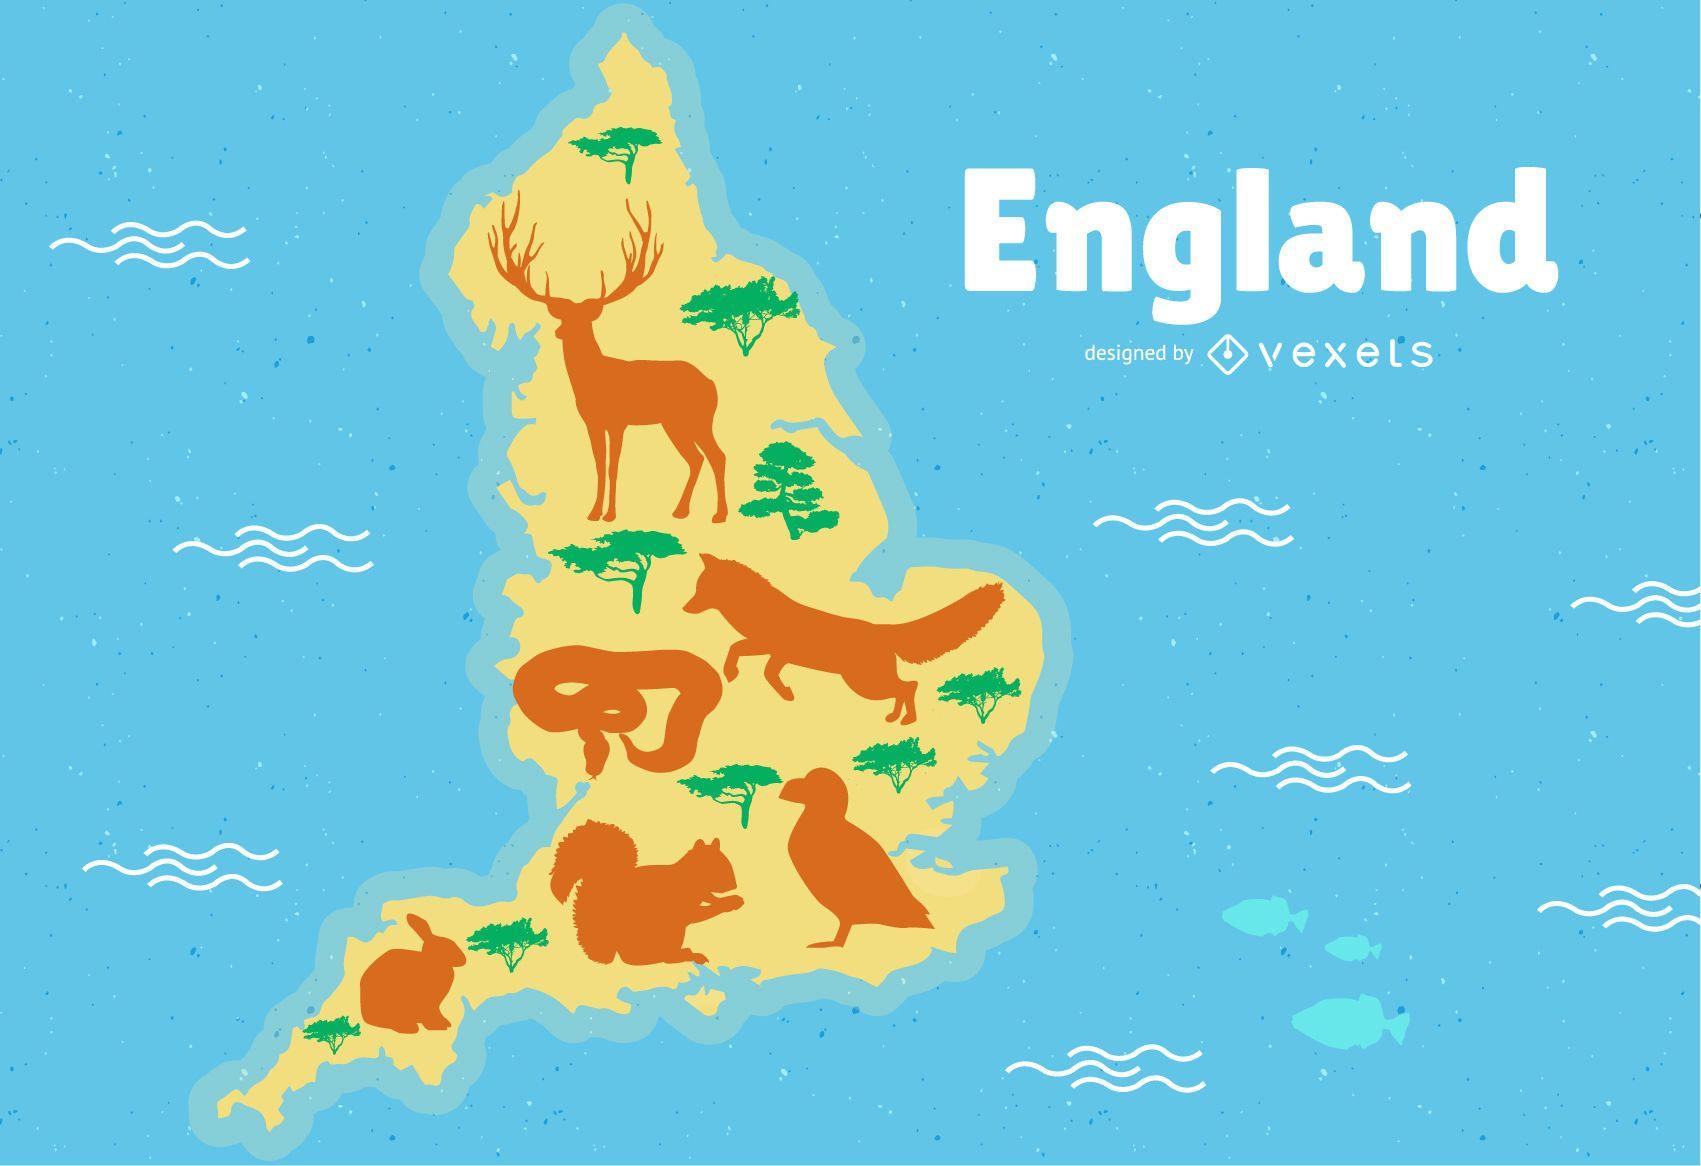 England Map Illustration - Vector download on australia illustration, london illustration, singapore illustration, tv illustration, chile illustration, italy illustration, thailand illustration, africa illustration, china illustration, dj illustration,